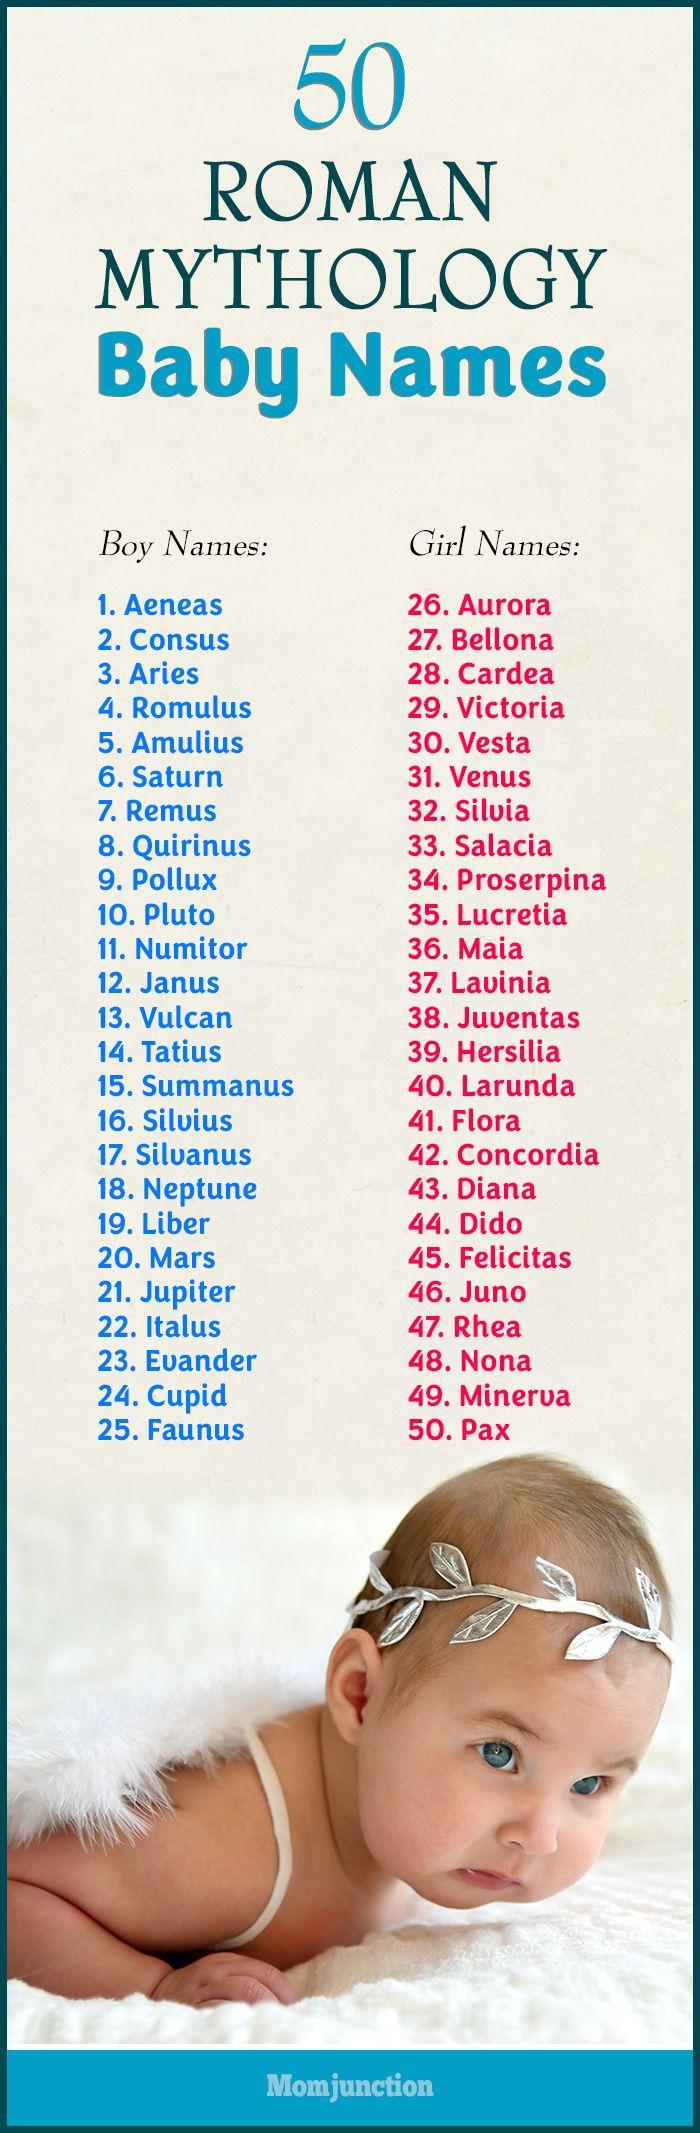 50 Wonderful Roman Mythology Names For Your Baby | Roman ...